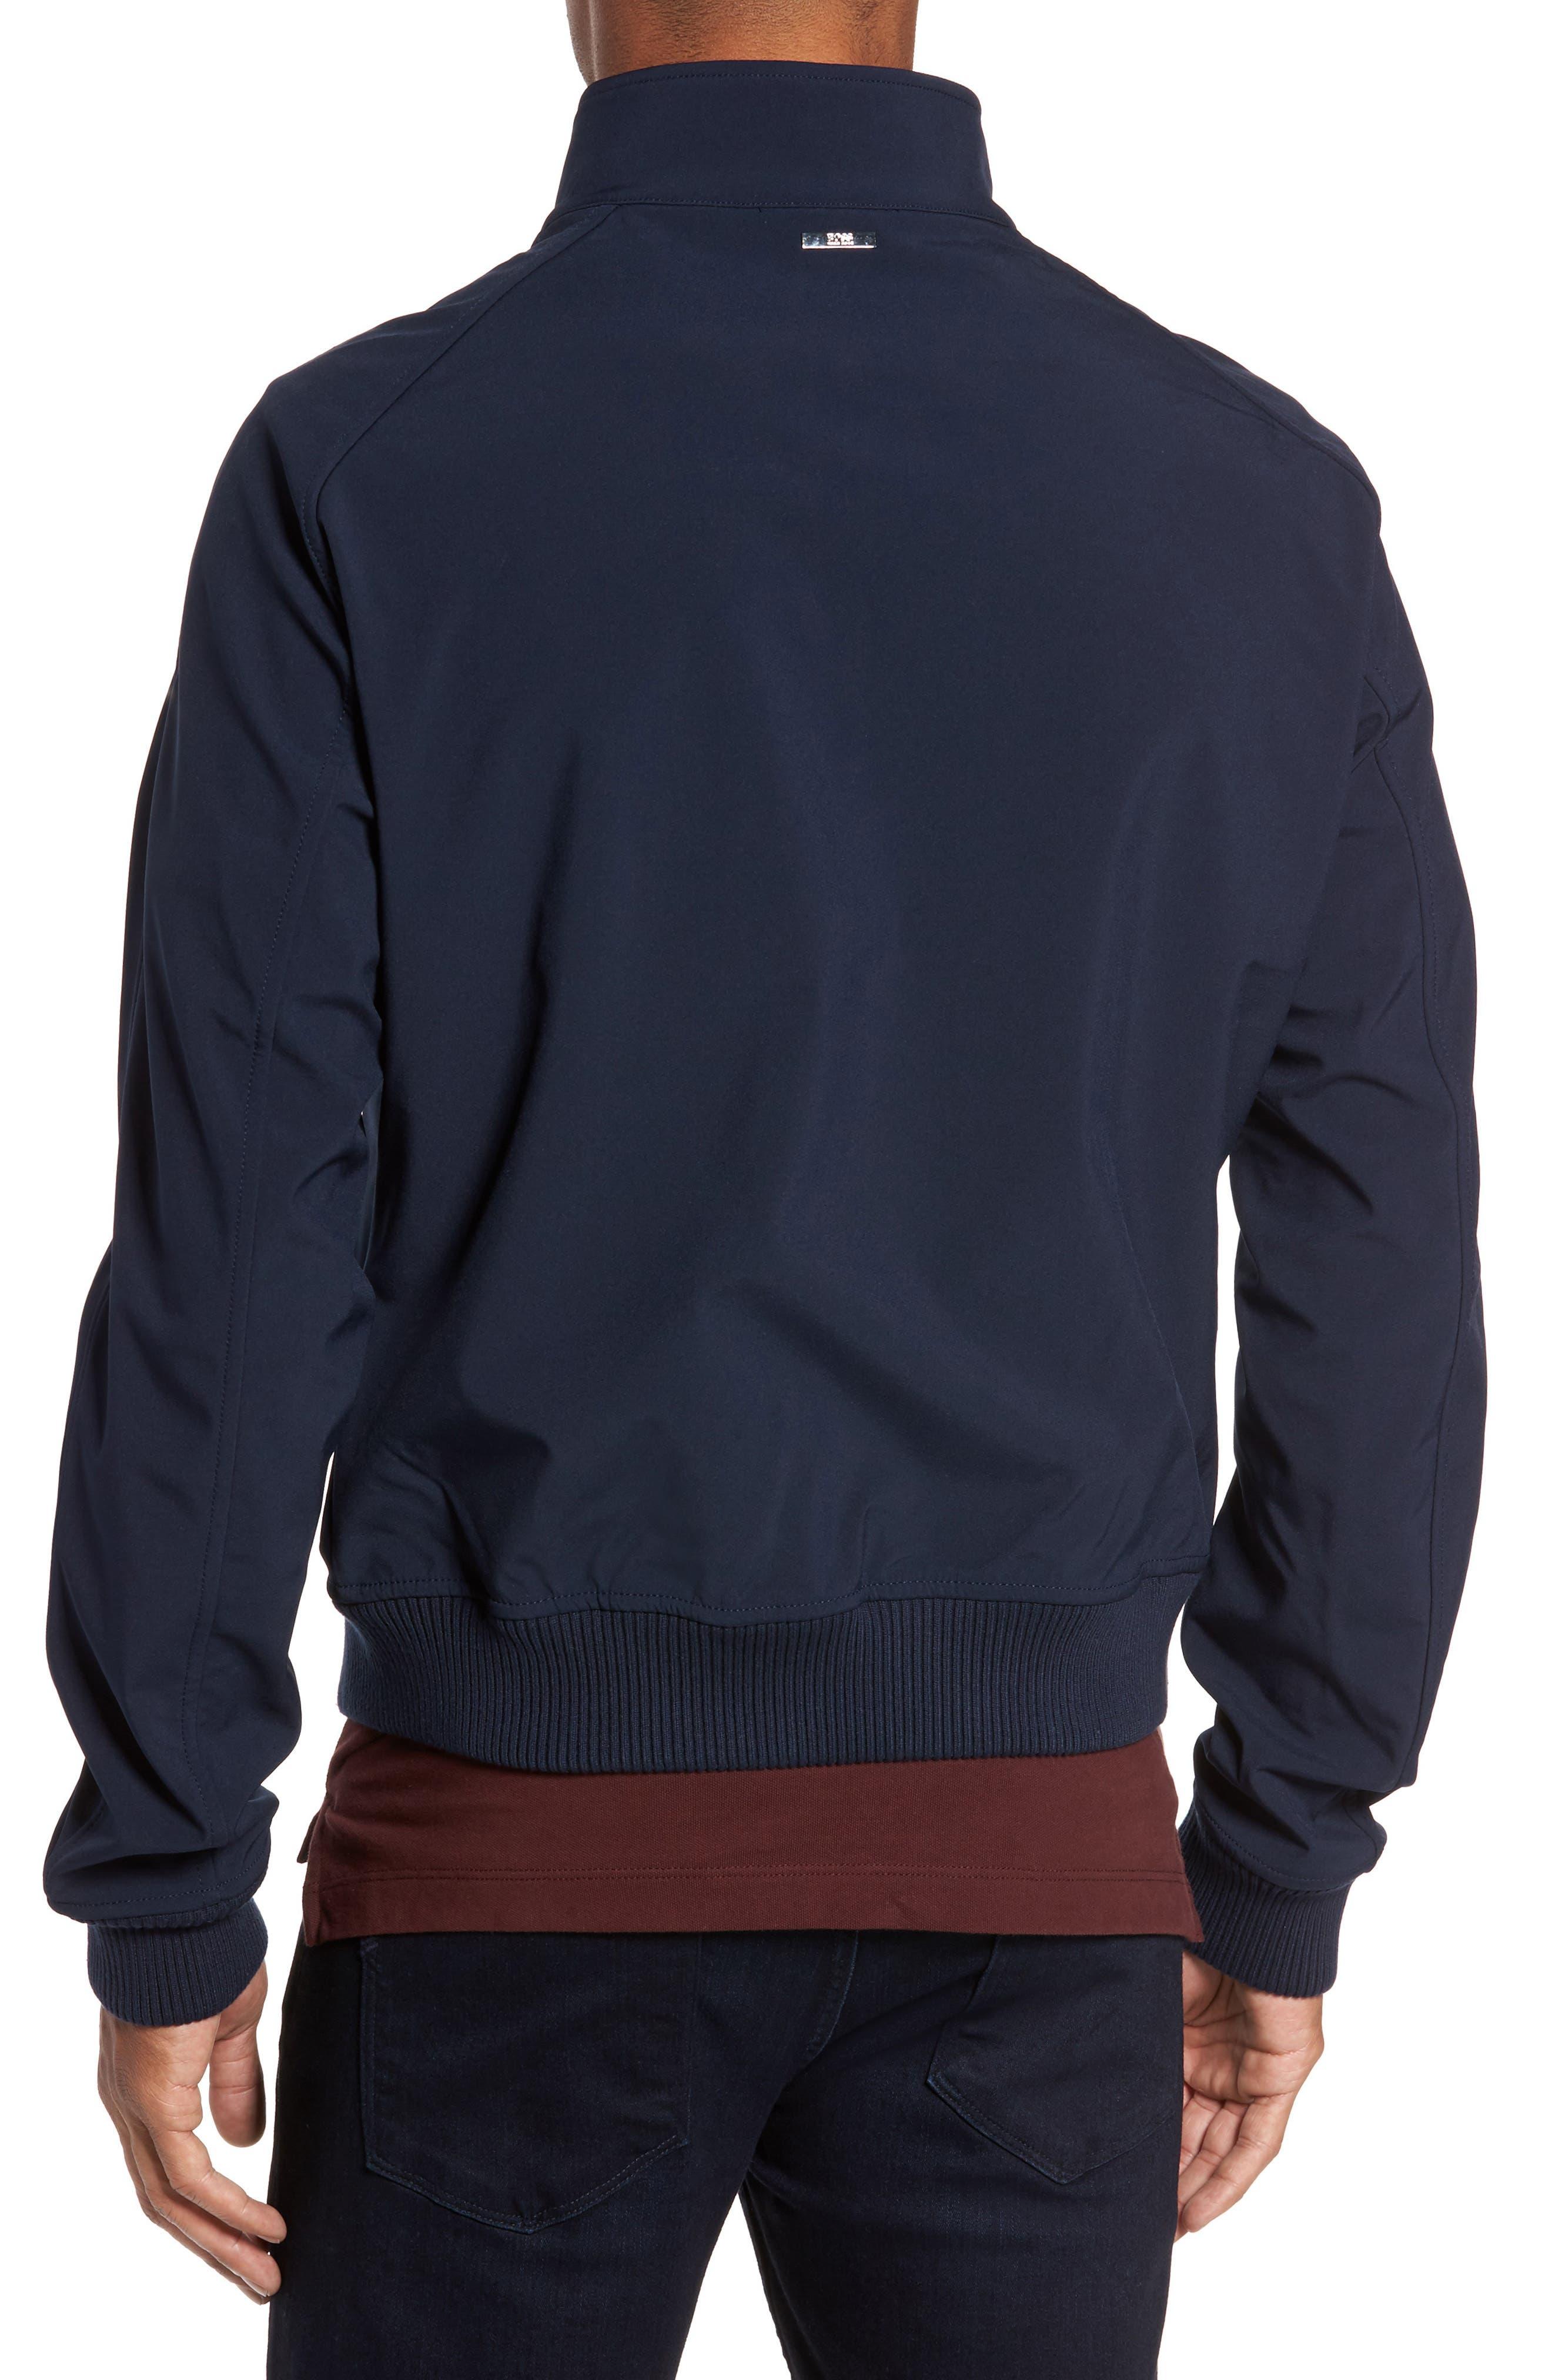 Corva Technical Jacket,                             Alternate thumbnail 2, color,                             410